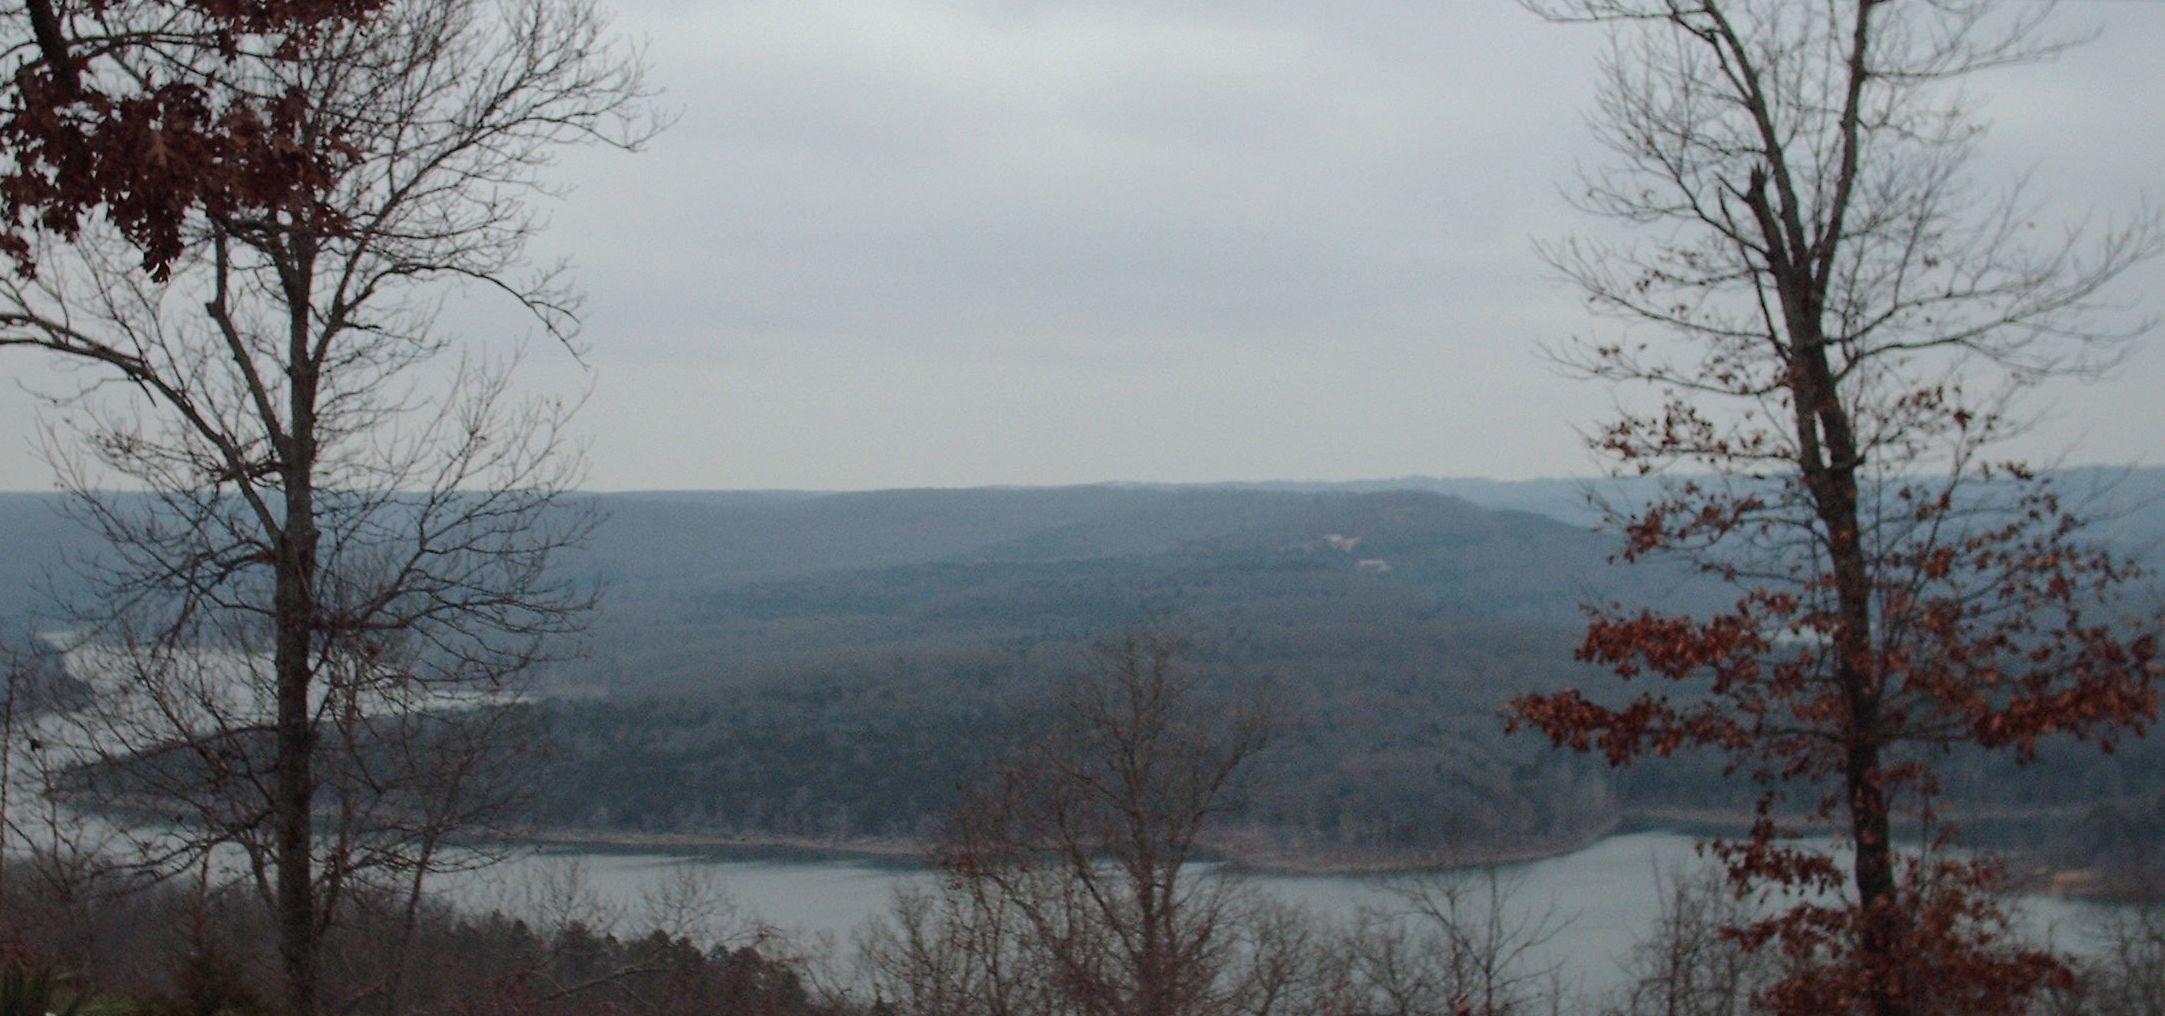 Rainy Day - Table Rock Lake